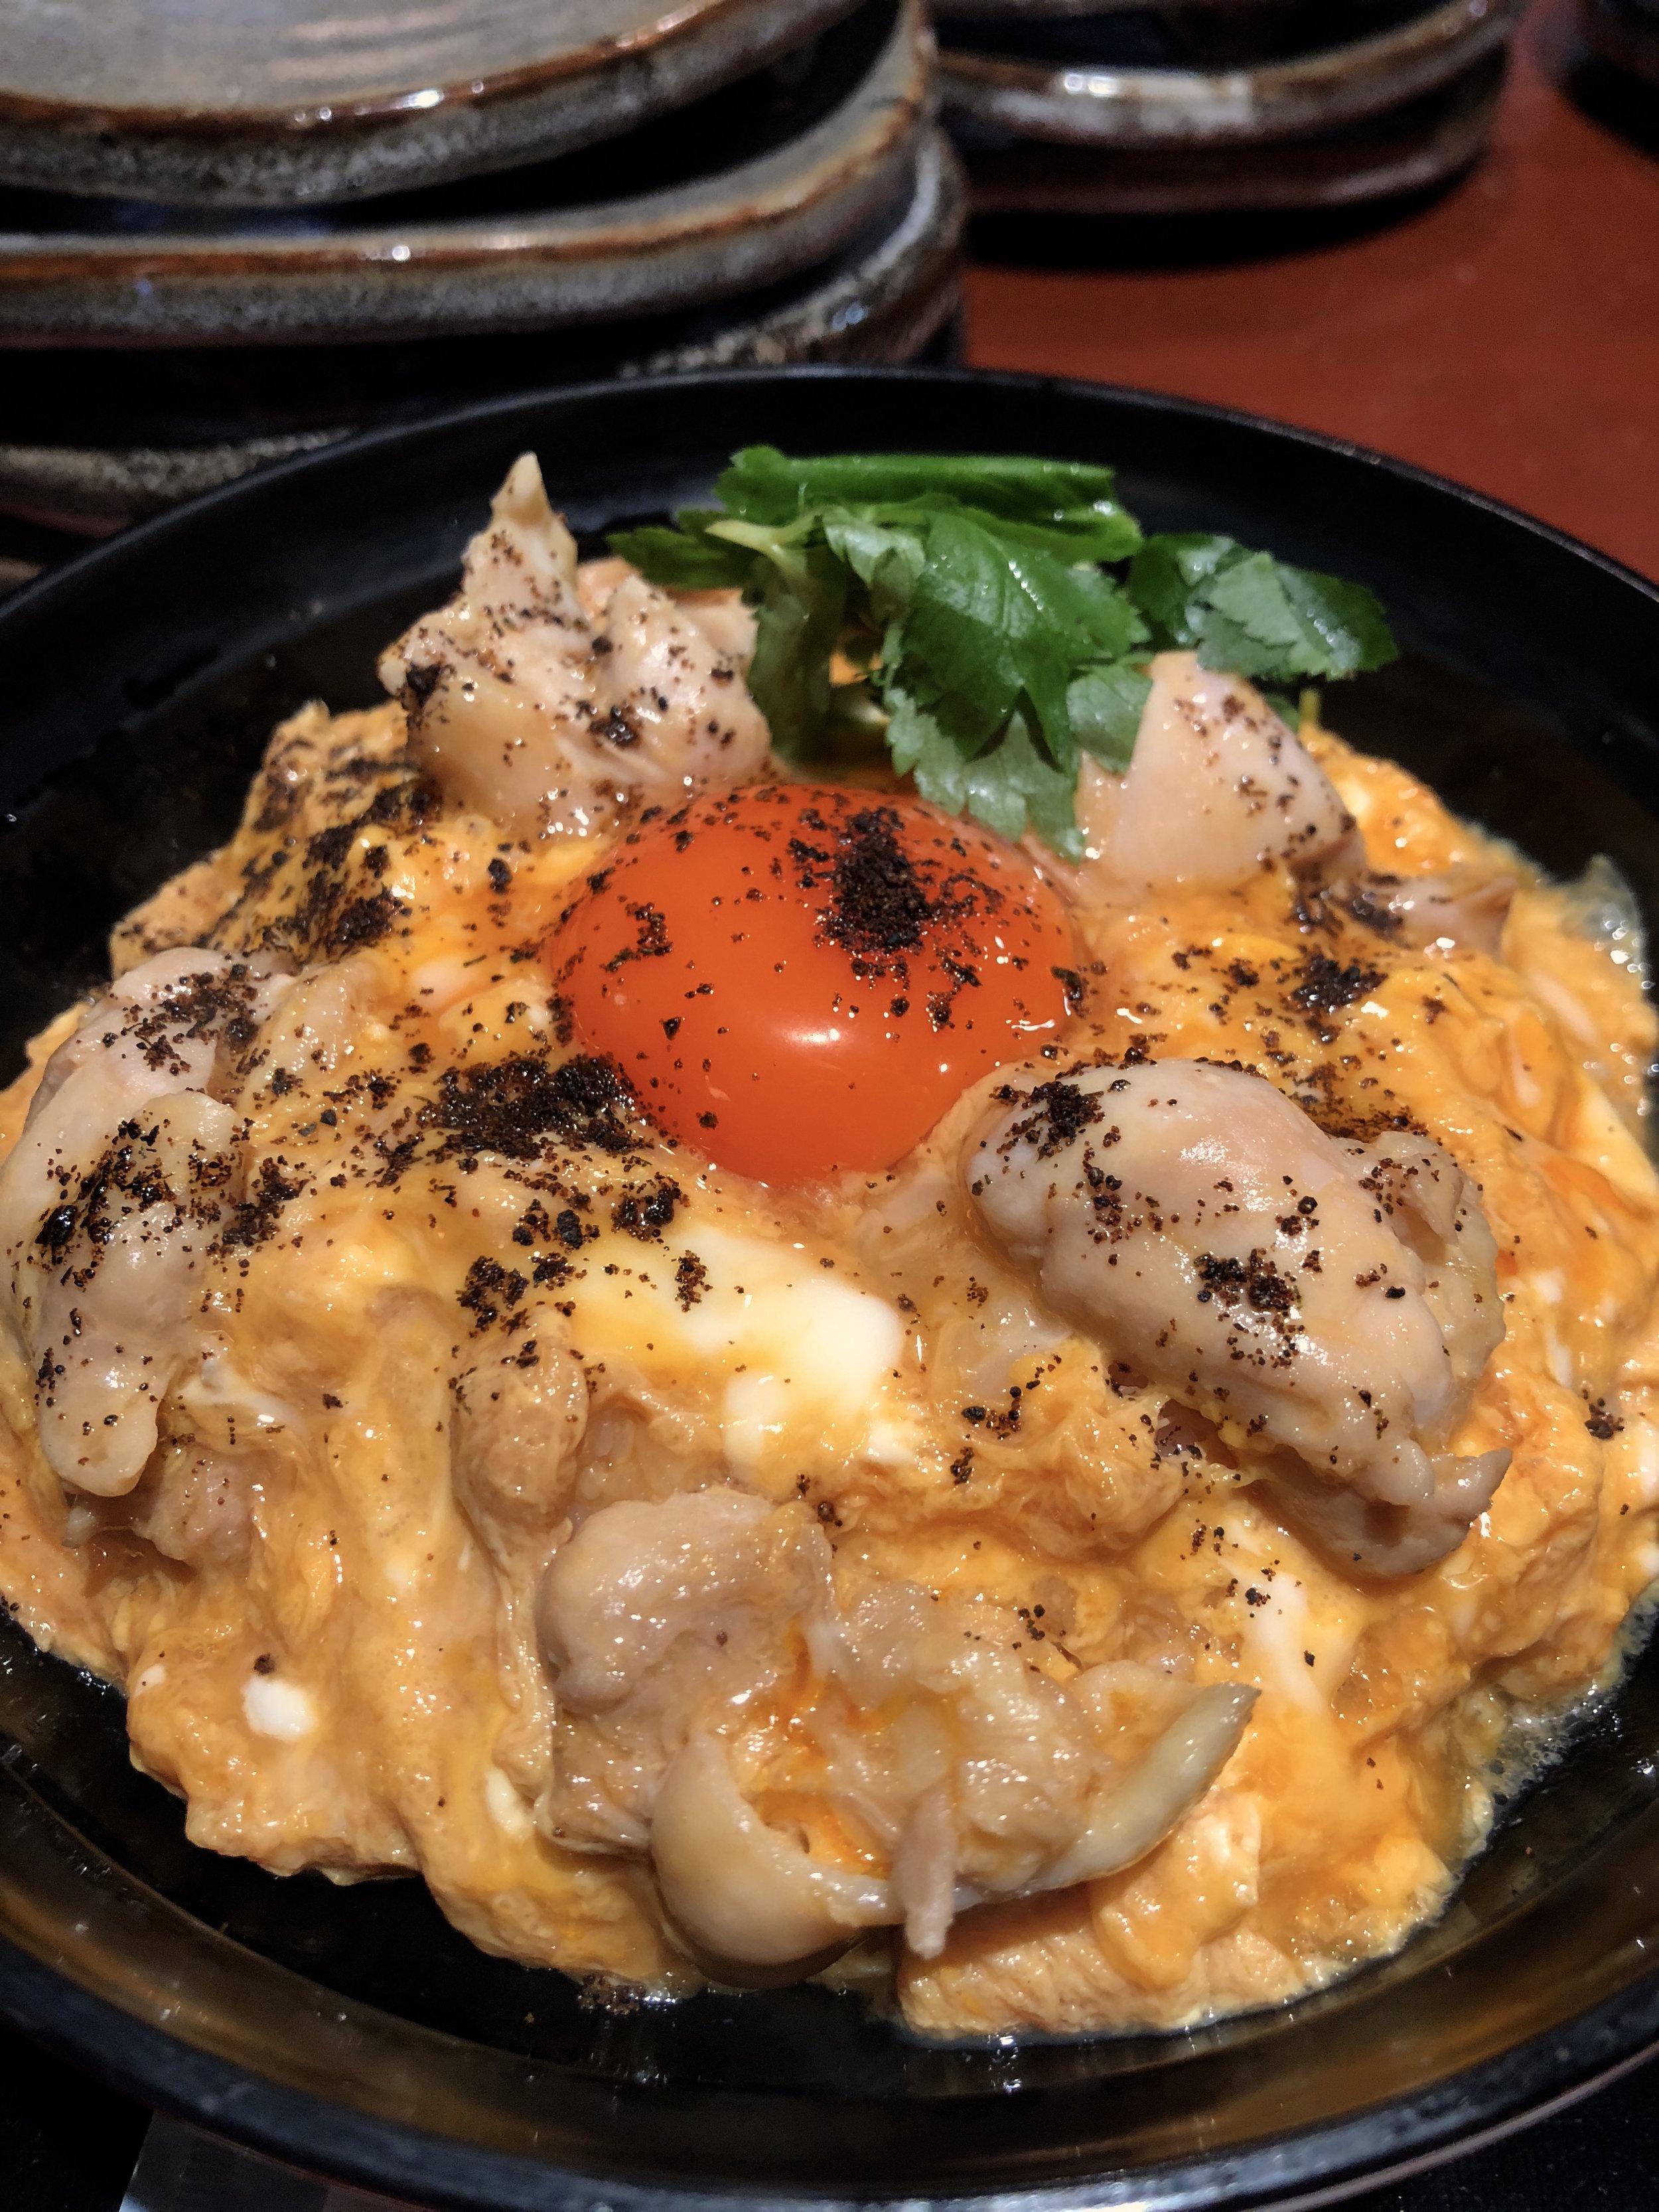 oyakodon-nakameguro-japanfoodtrips-tokyofoodtour.JPG